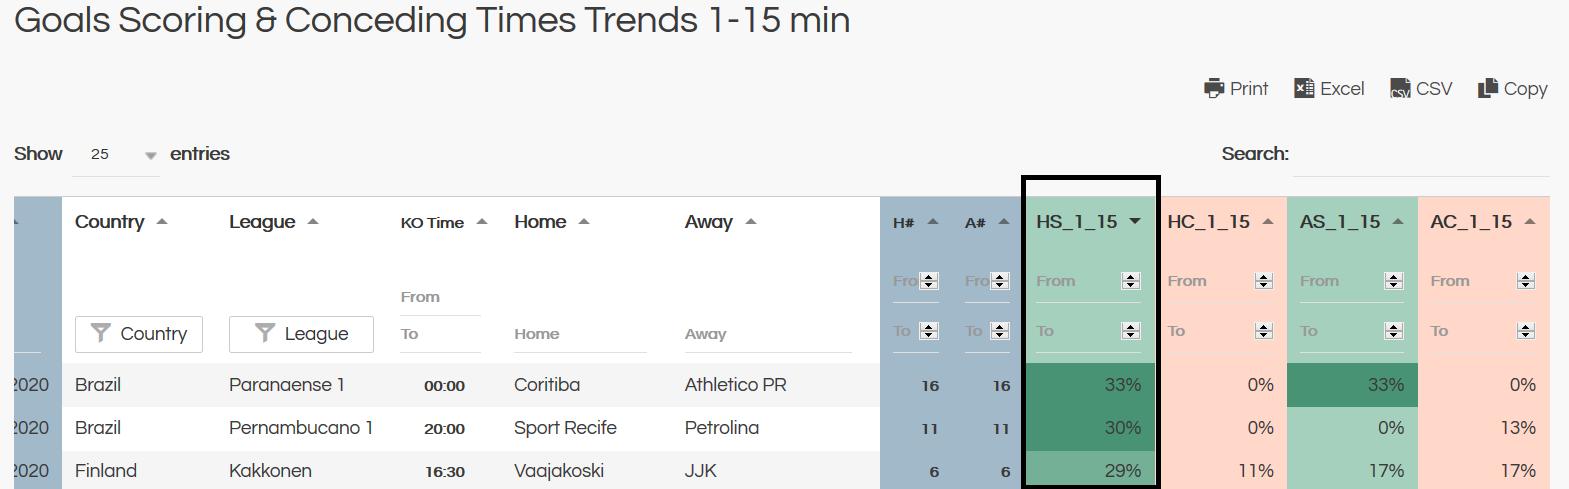 first half goals 1-15 minutes goals trends